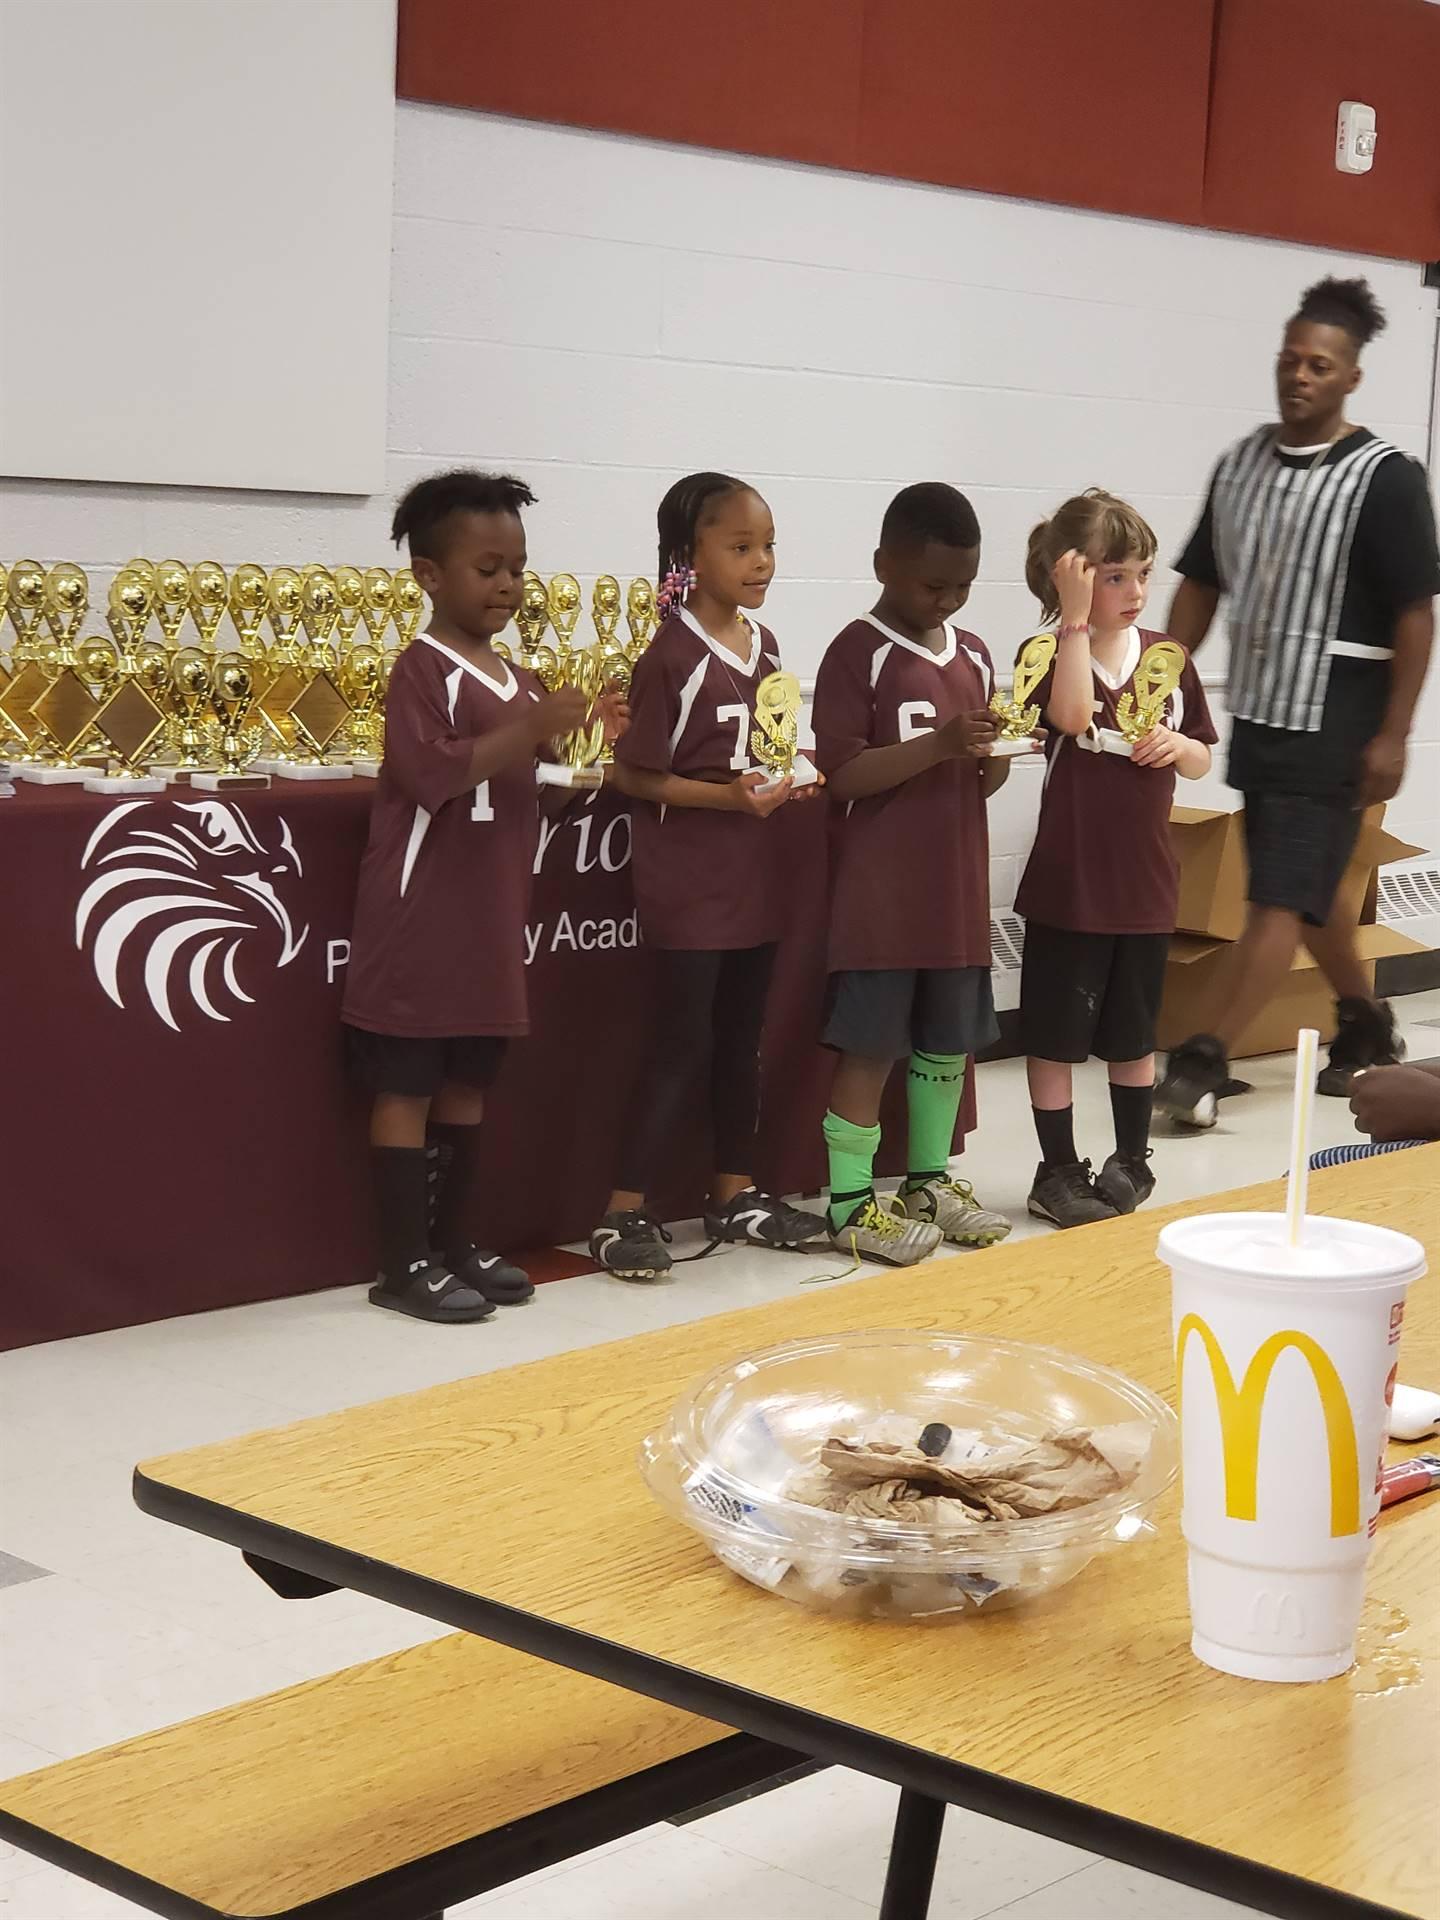 kids getting soccer trophies